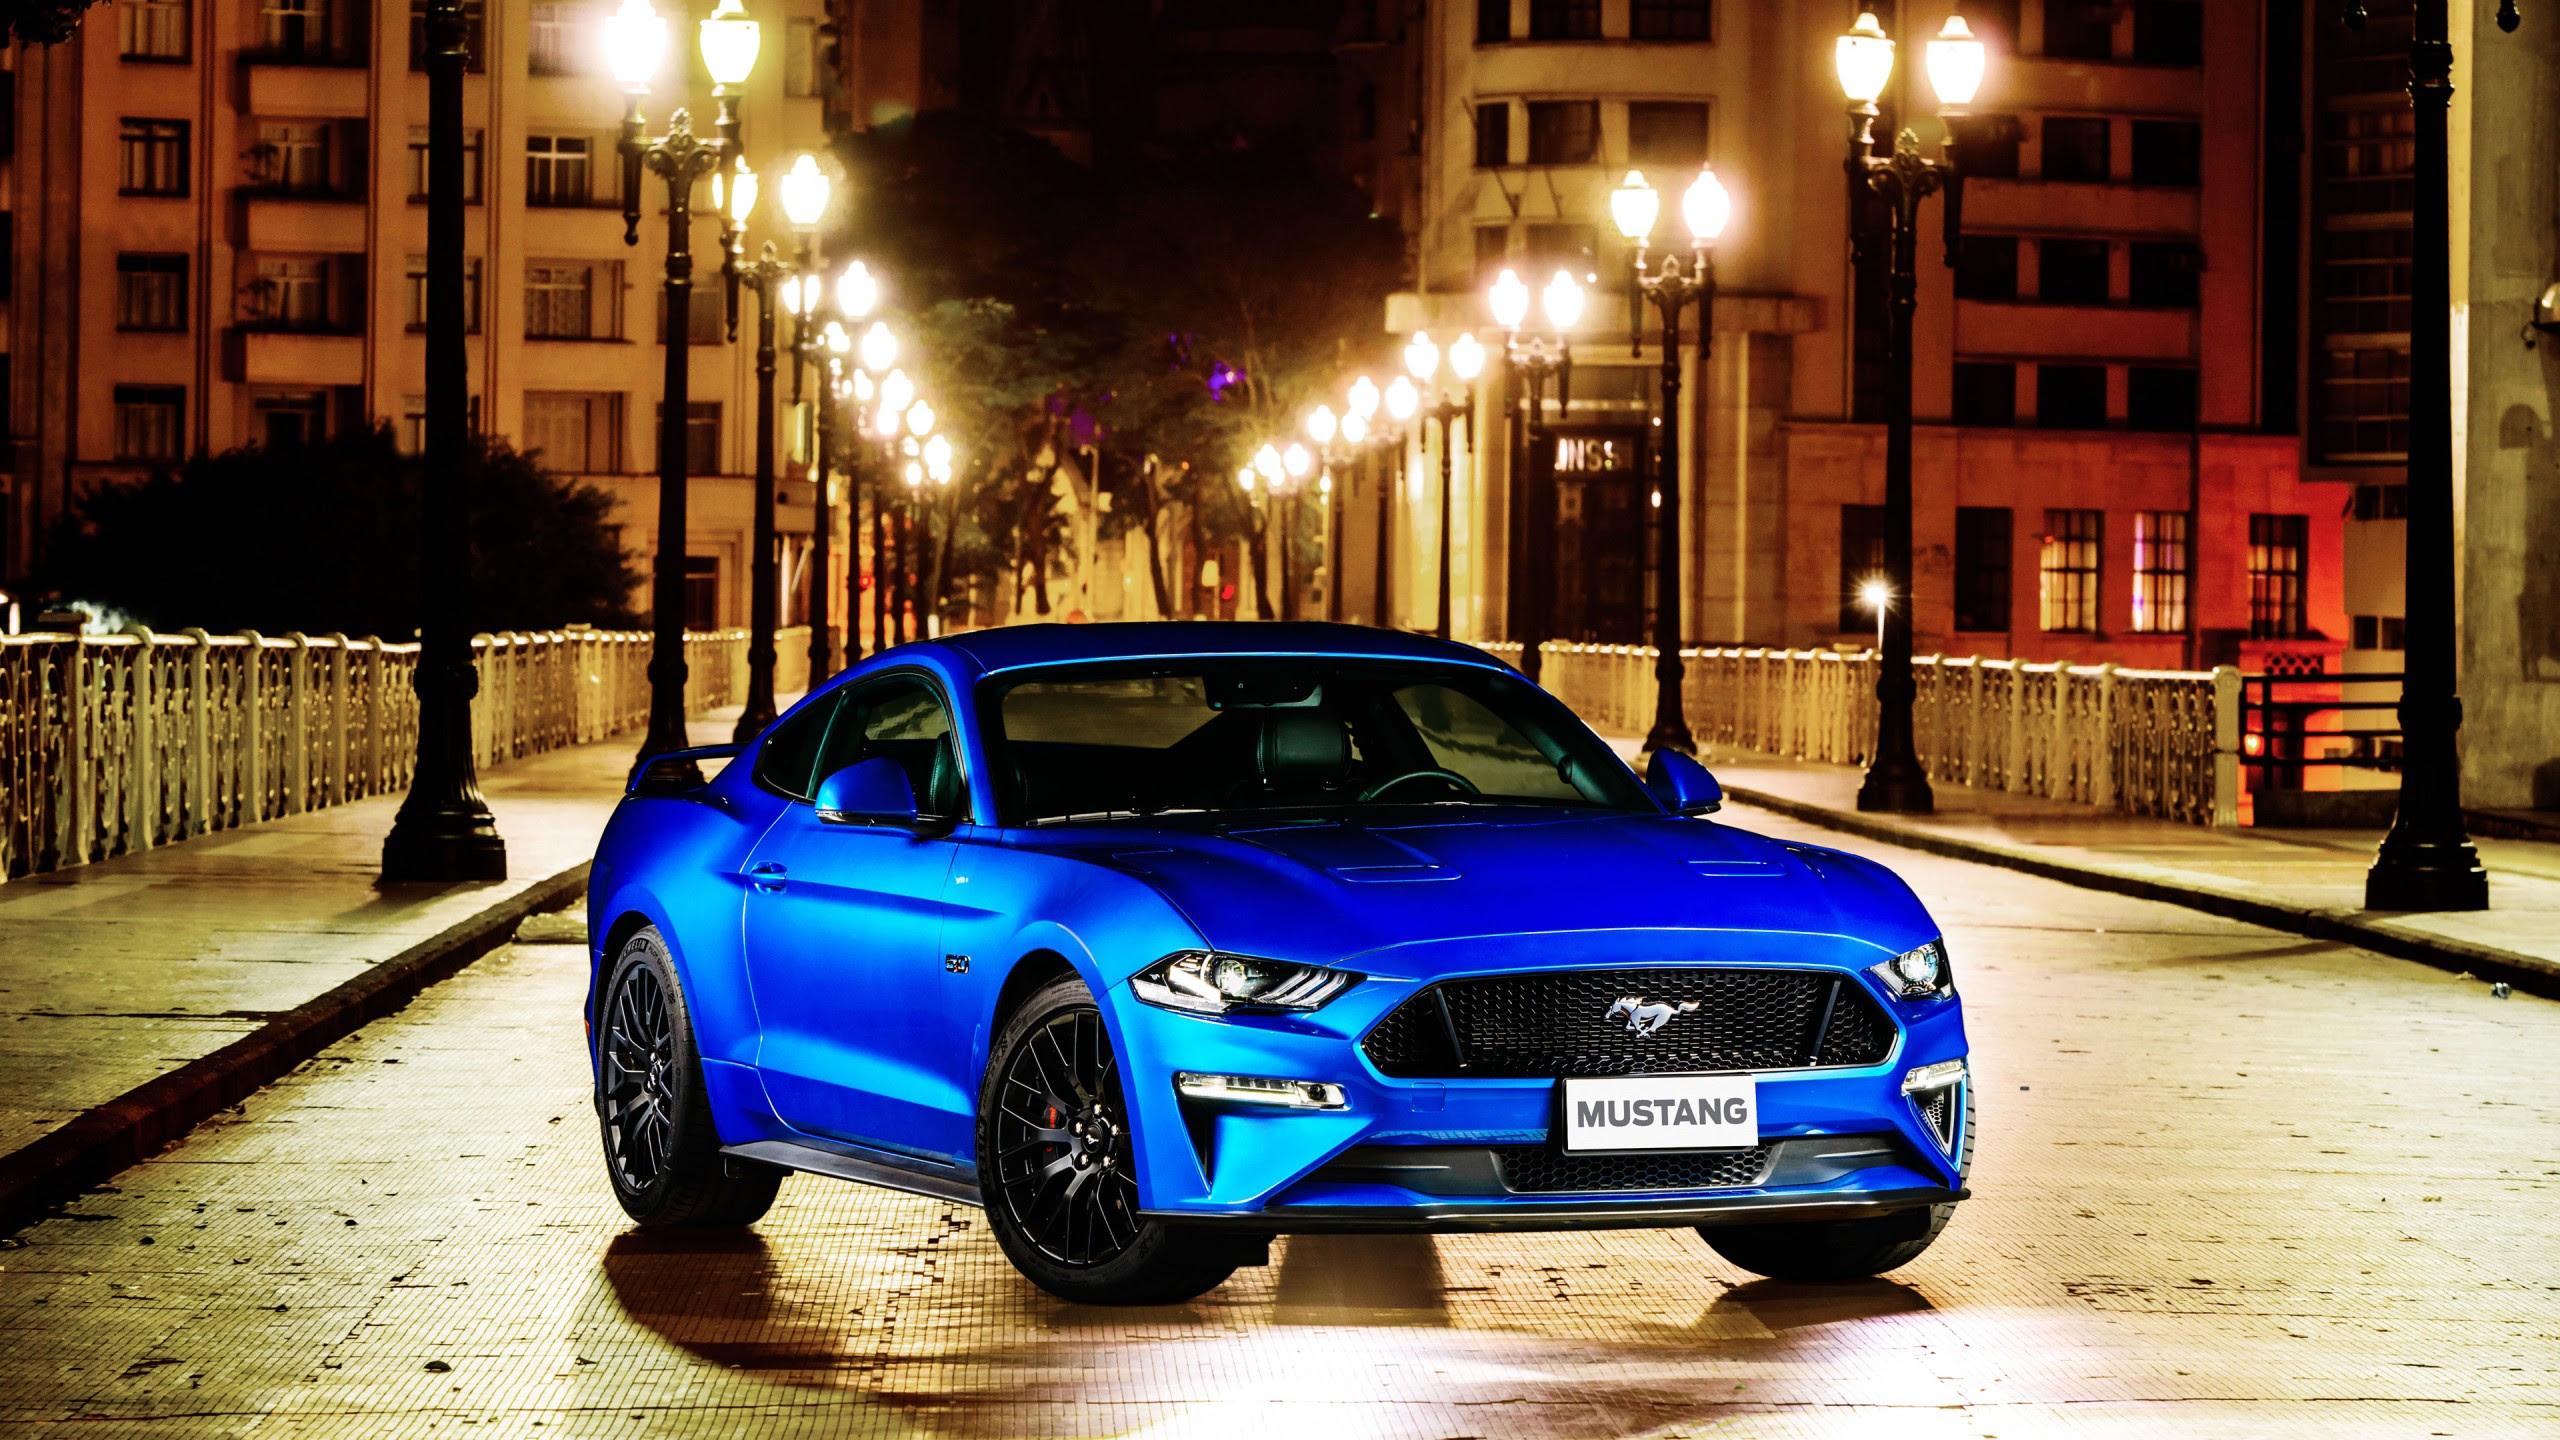 2018 Ford Mustang GT Fastback 4K 8 Wallpaper | HD Car ...